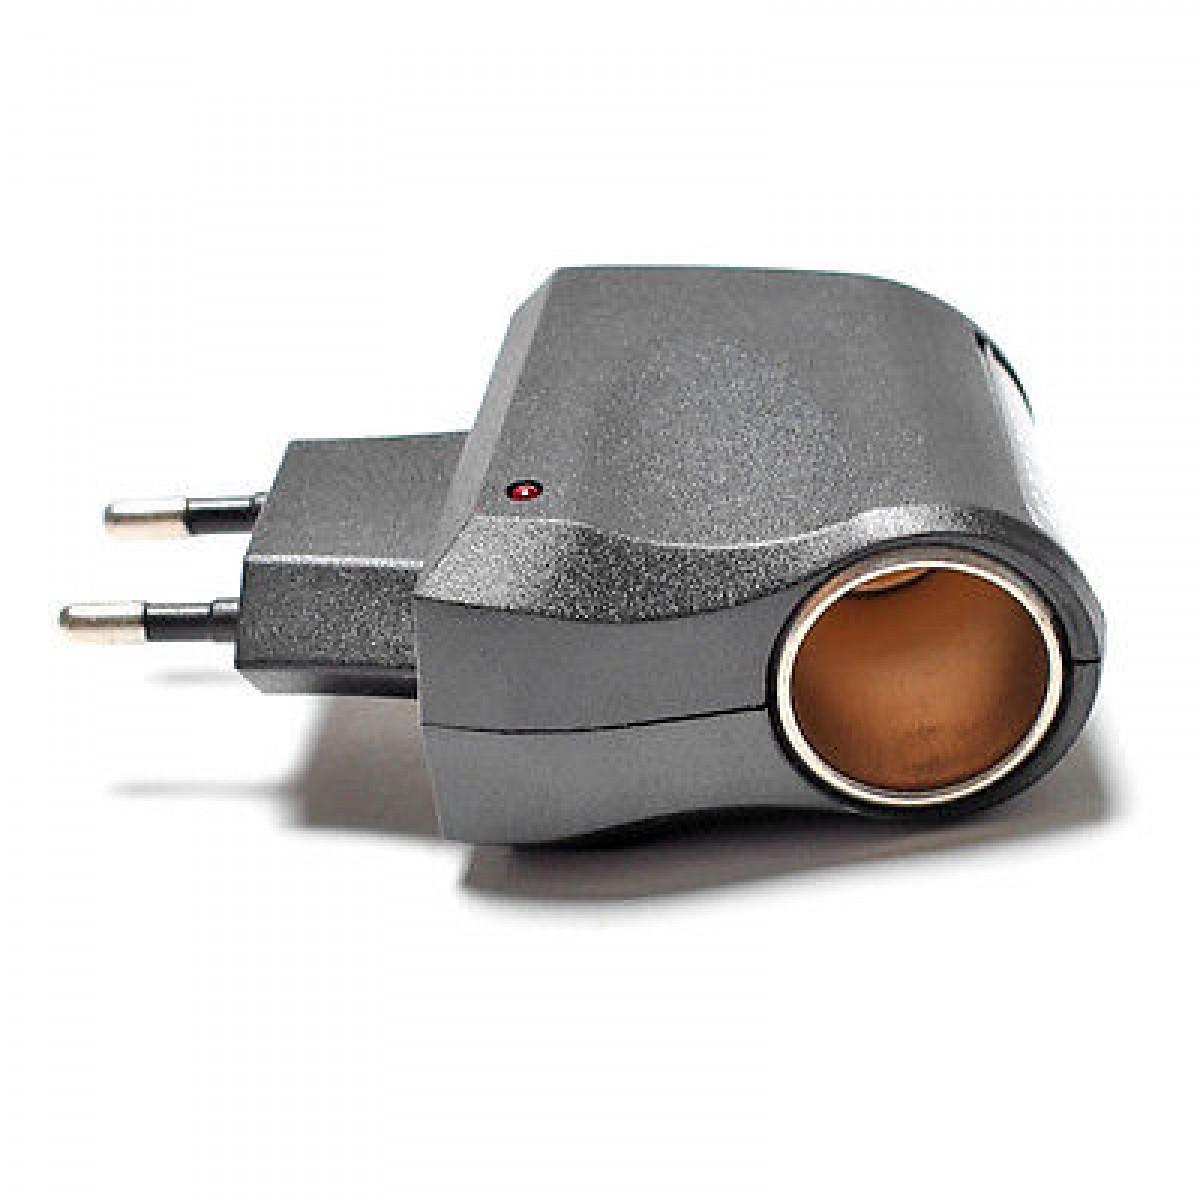 Soroko trading ltd smart gadgets electronics spy hidden new 110v 220v ac to 12v dc eu car power adapter converter publicscrutiny Image collections